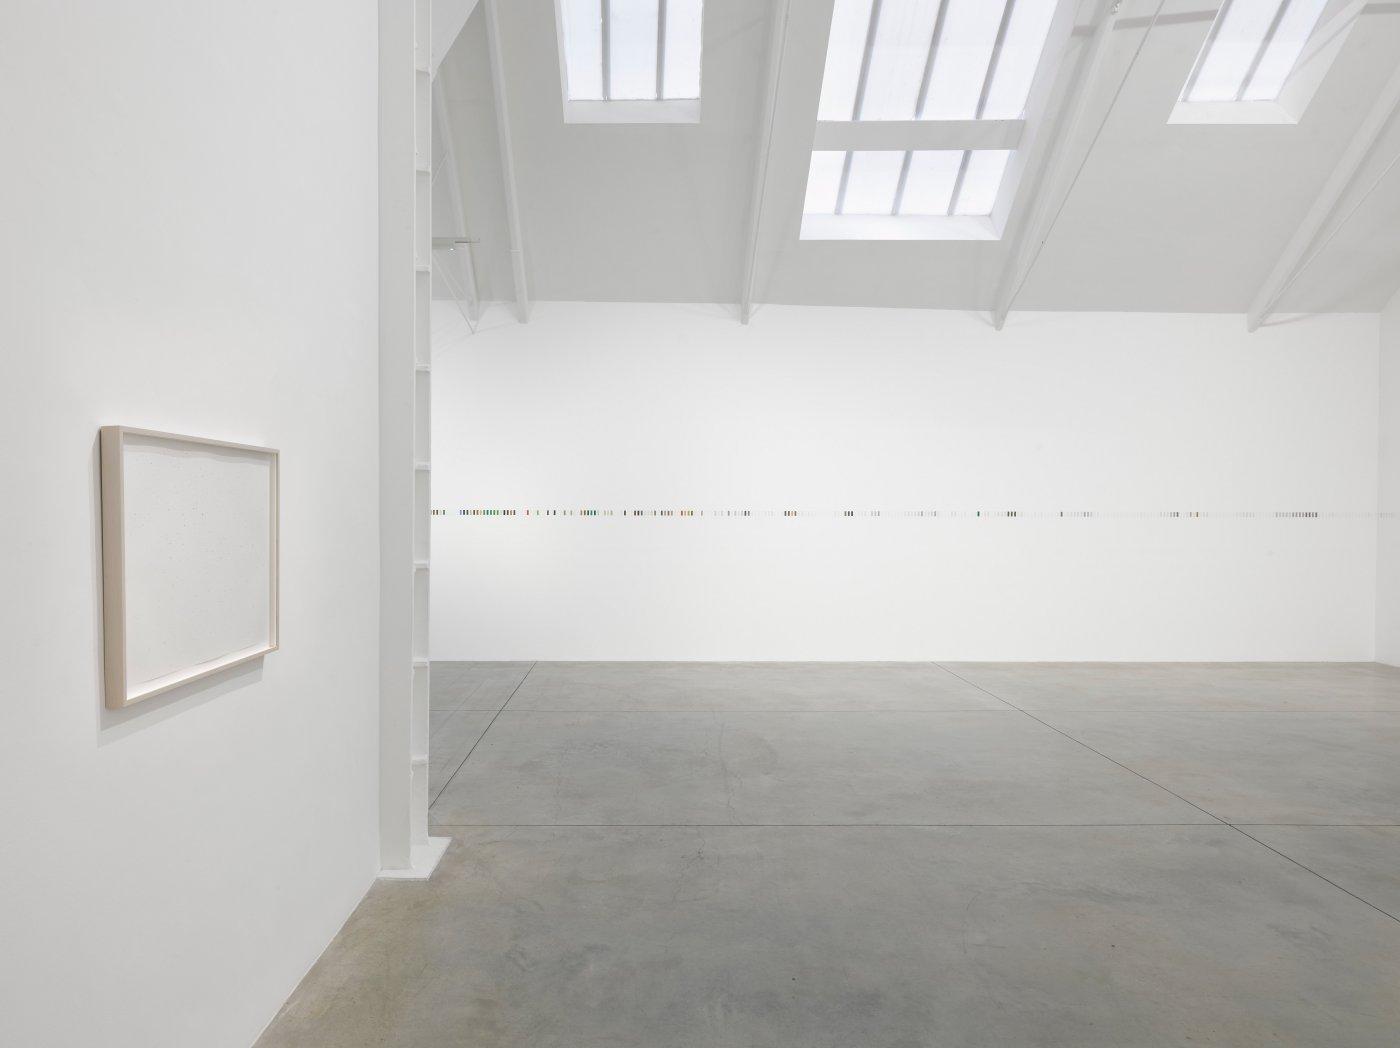 Lisson Gallery Bell Street Spencer Finch 5